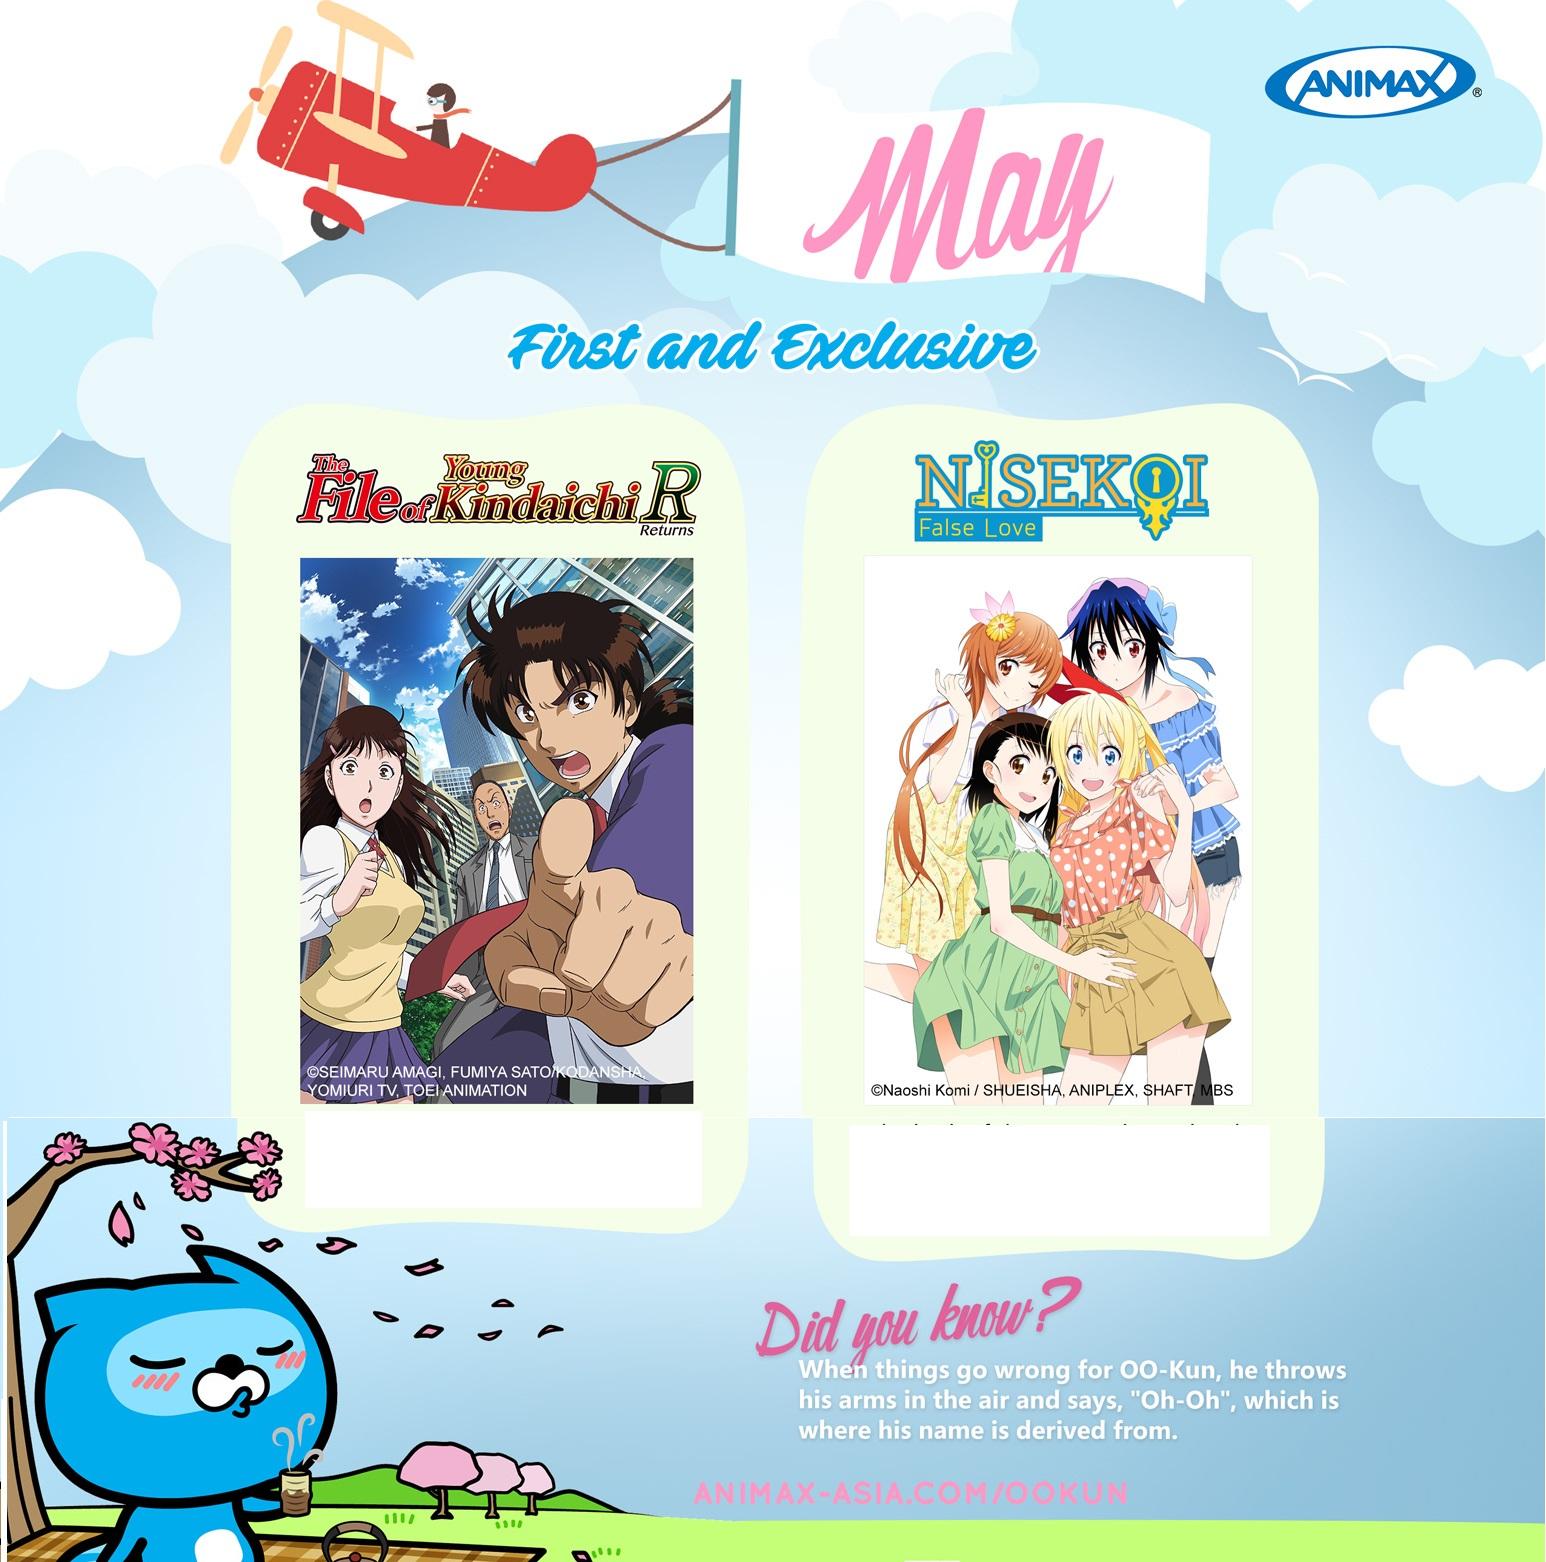 Nisekoi And Kindaichi Are Back On Animax